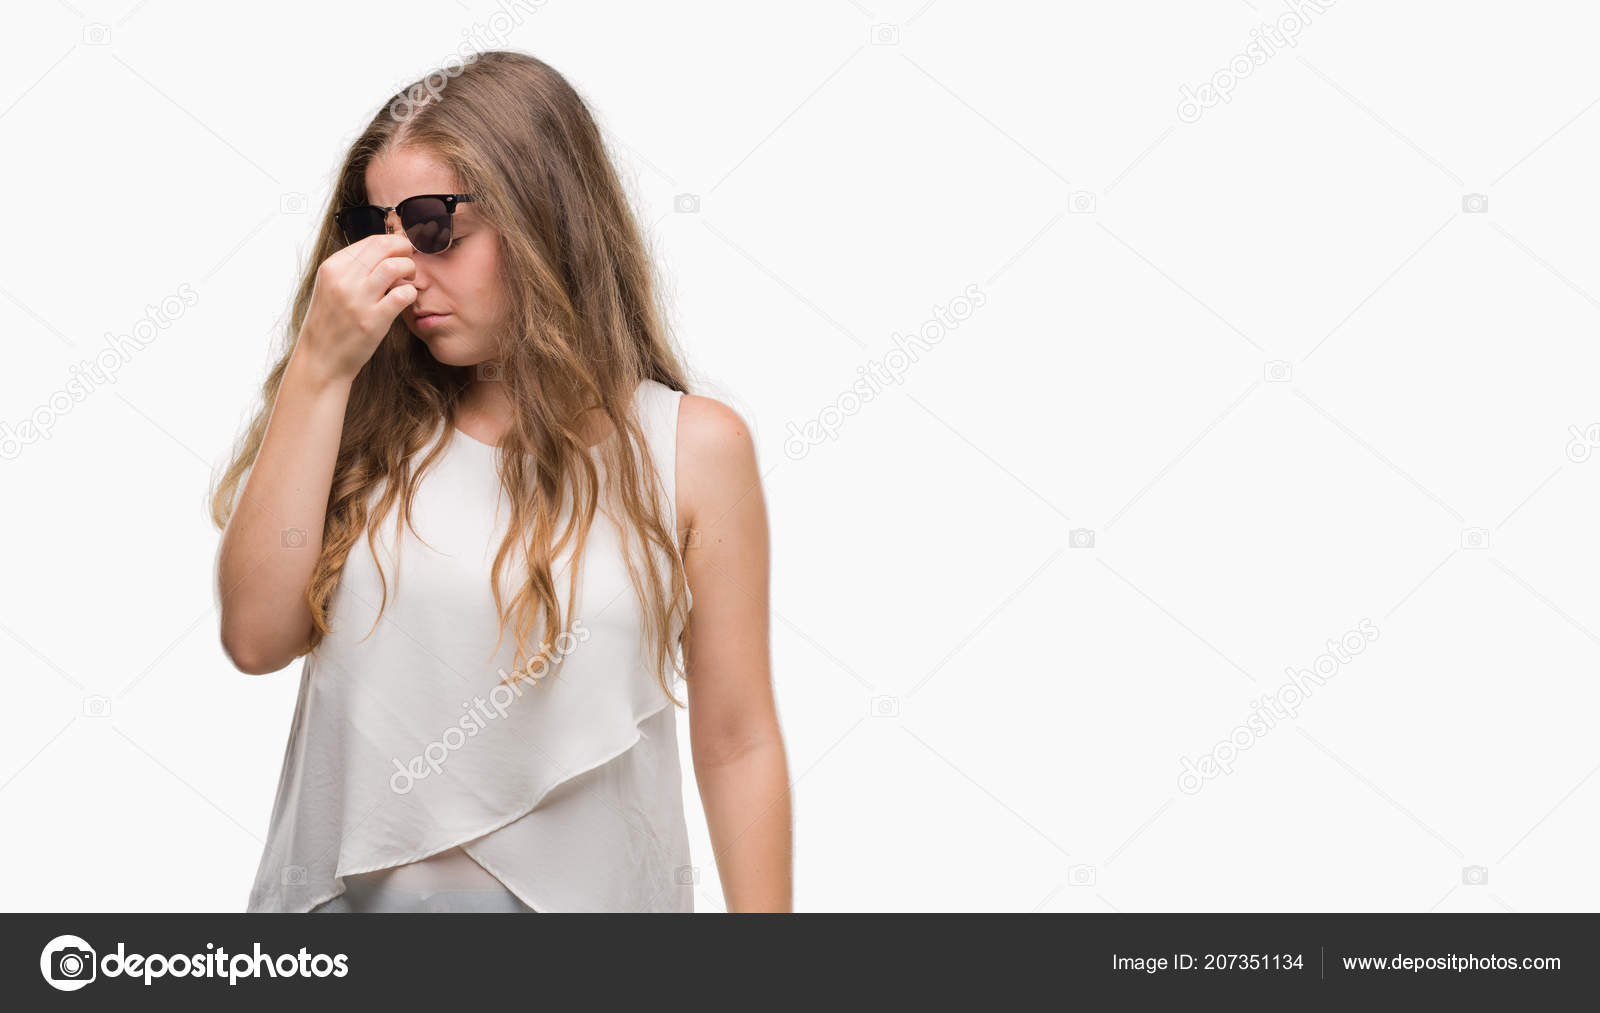 f983faf324 Νεαρή Ξανθιά Γυναίκα Που Φοράει Γυαλιά Ηλίου Κουρασμένος Τρίβοντας Μύτη —  Φωτογραφία Αρχείου